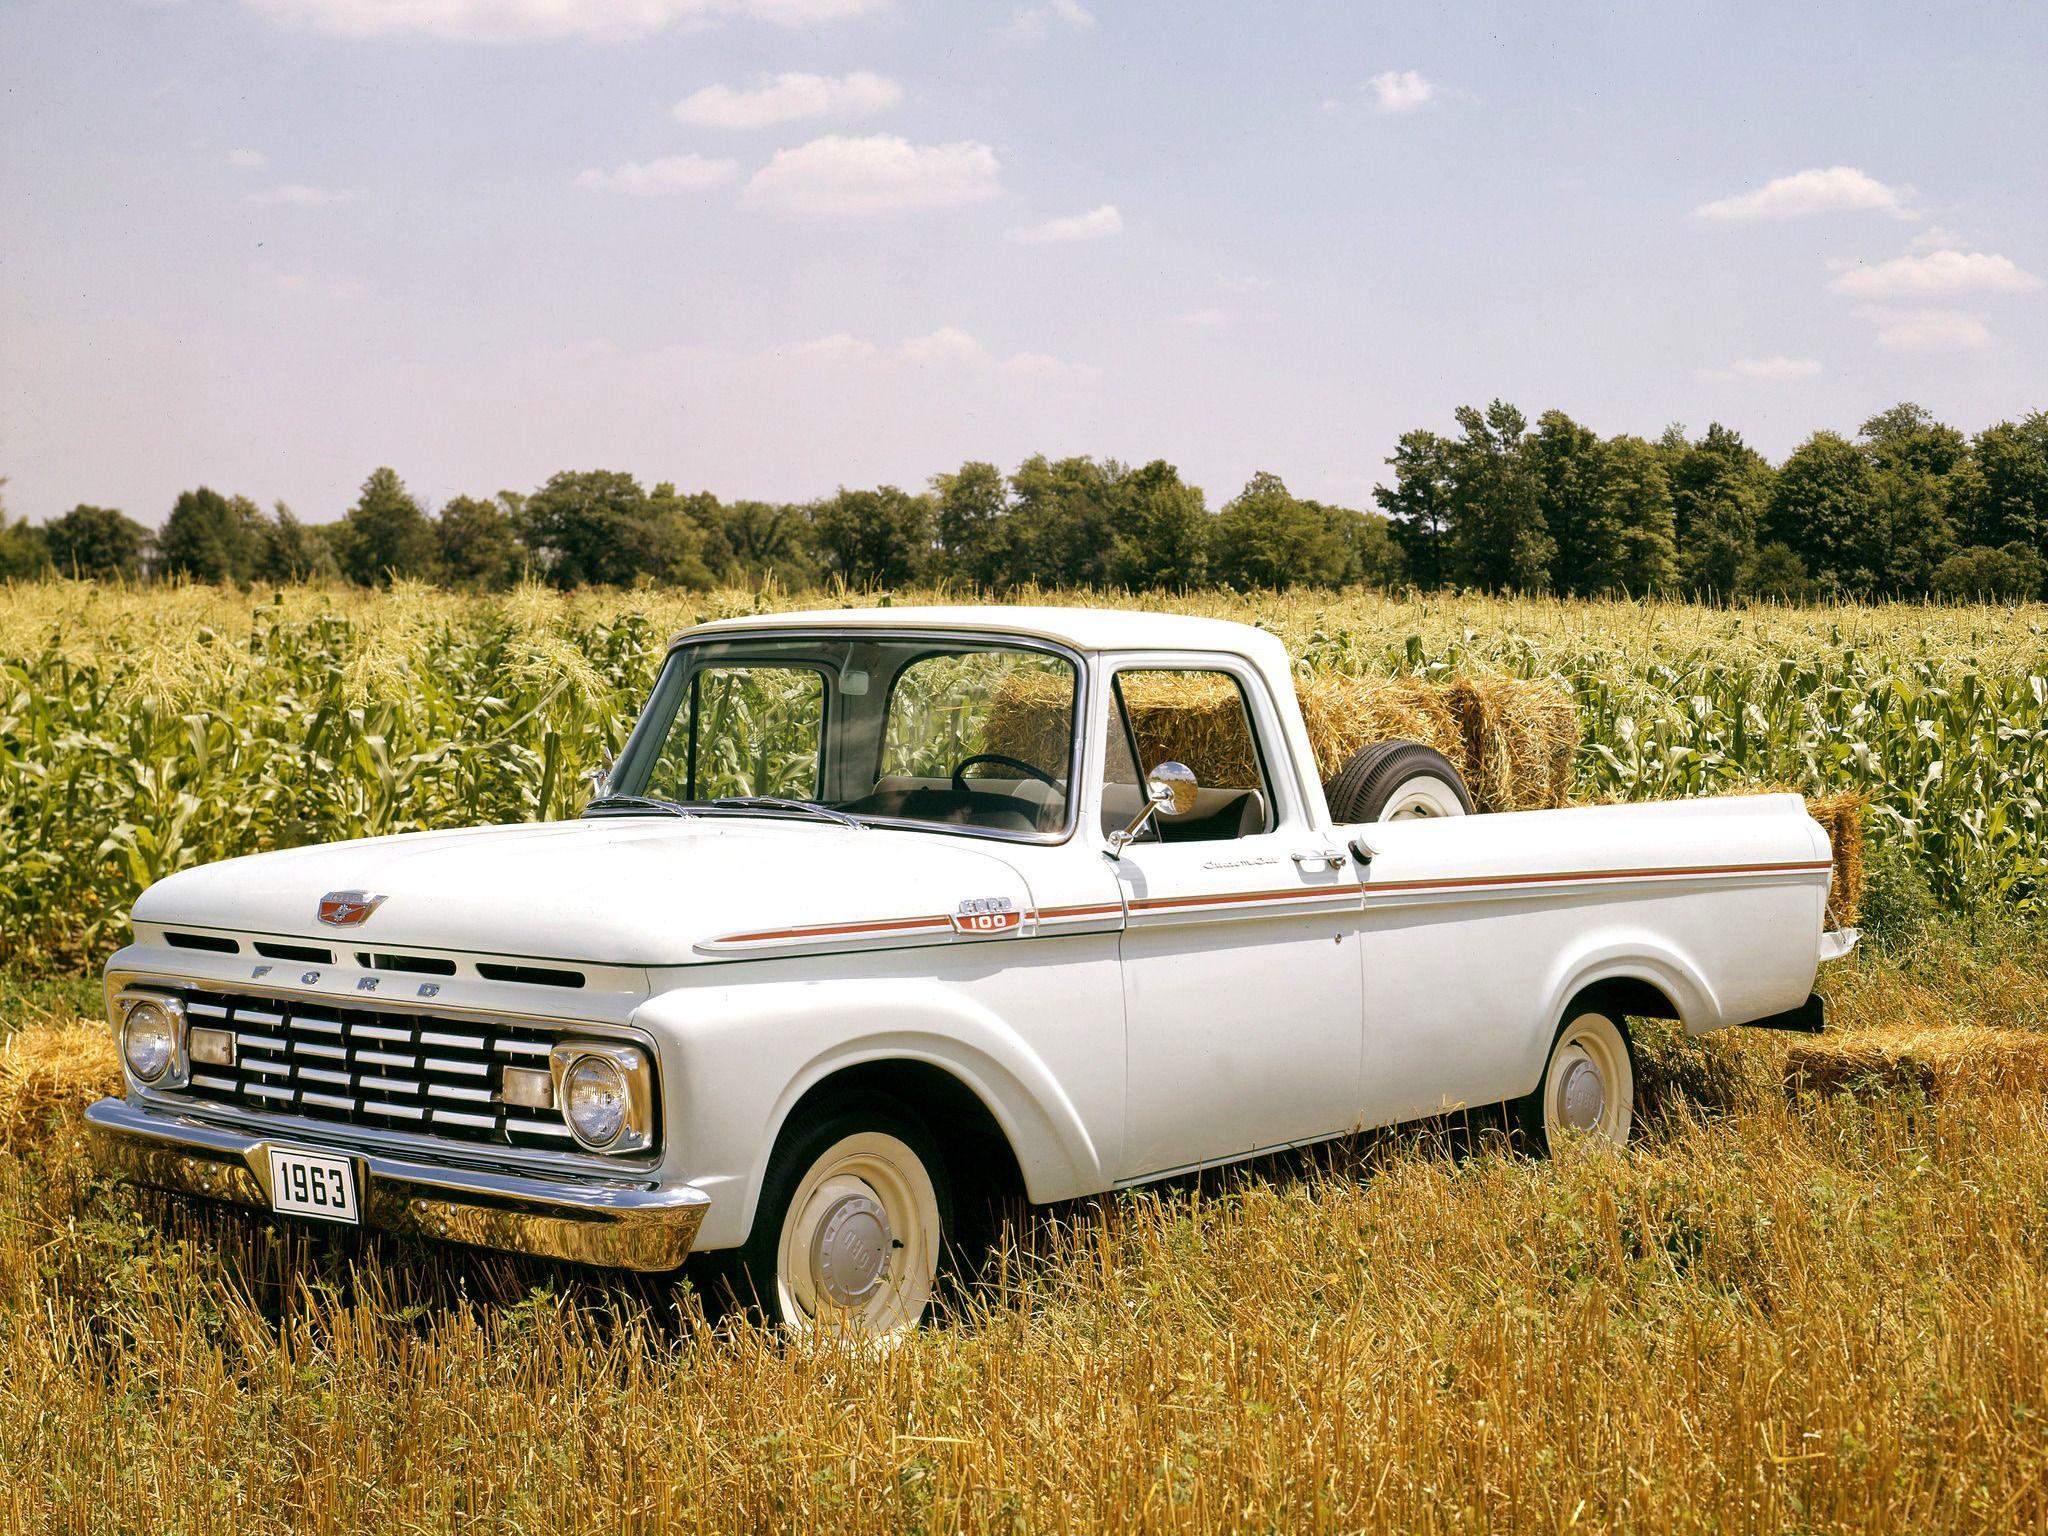 1963 Ford F-100 Custom Cab Styleside Pickup